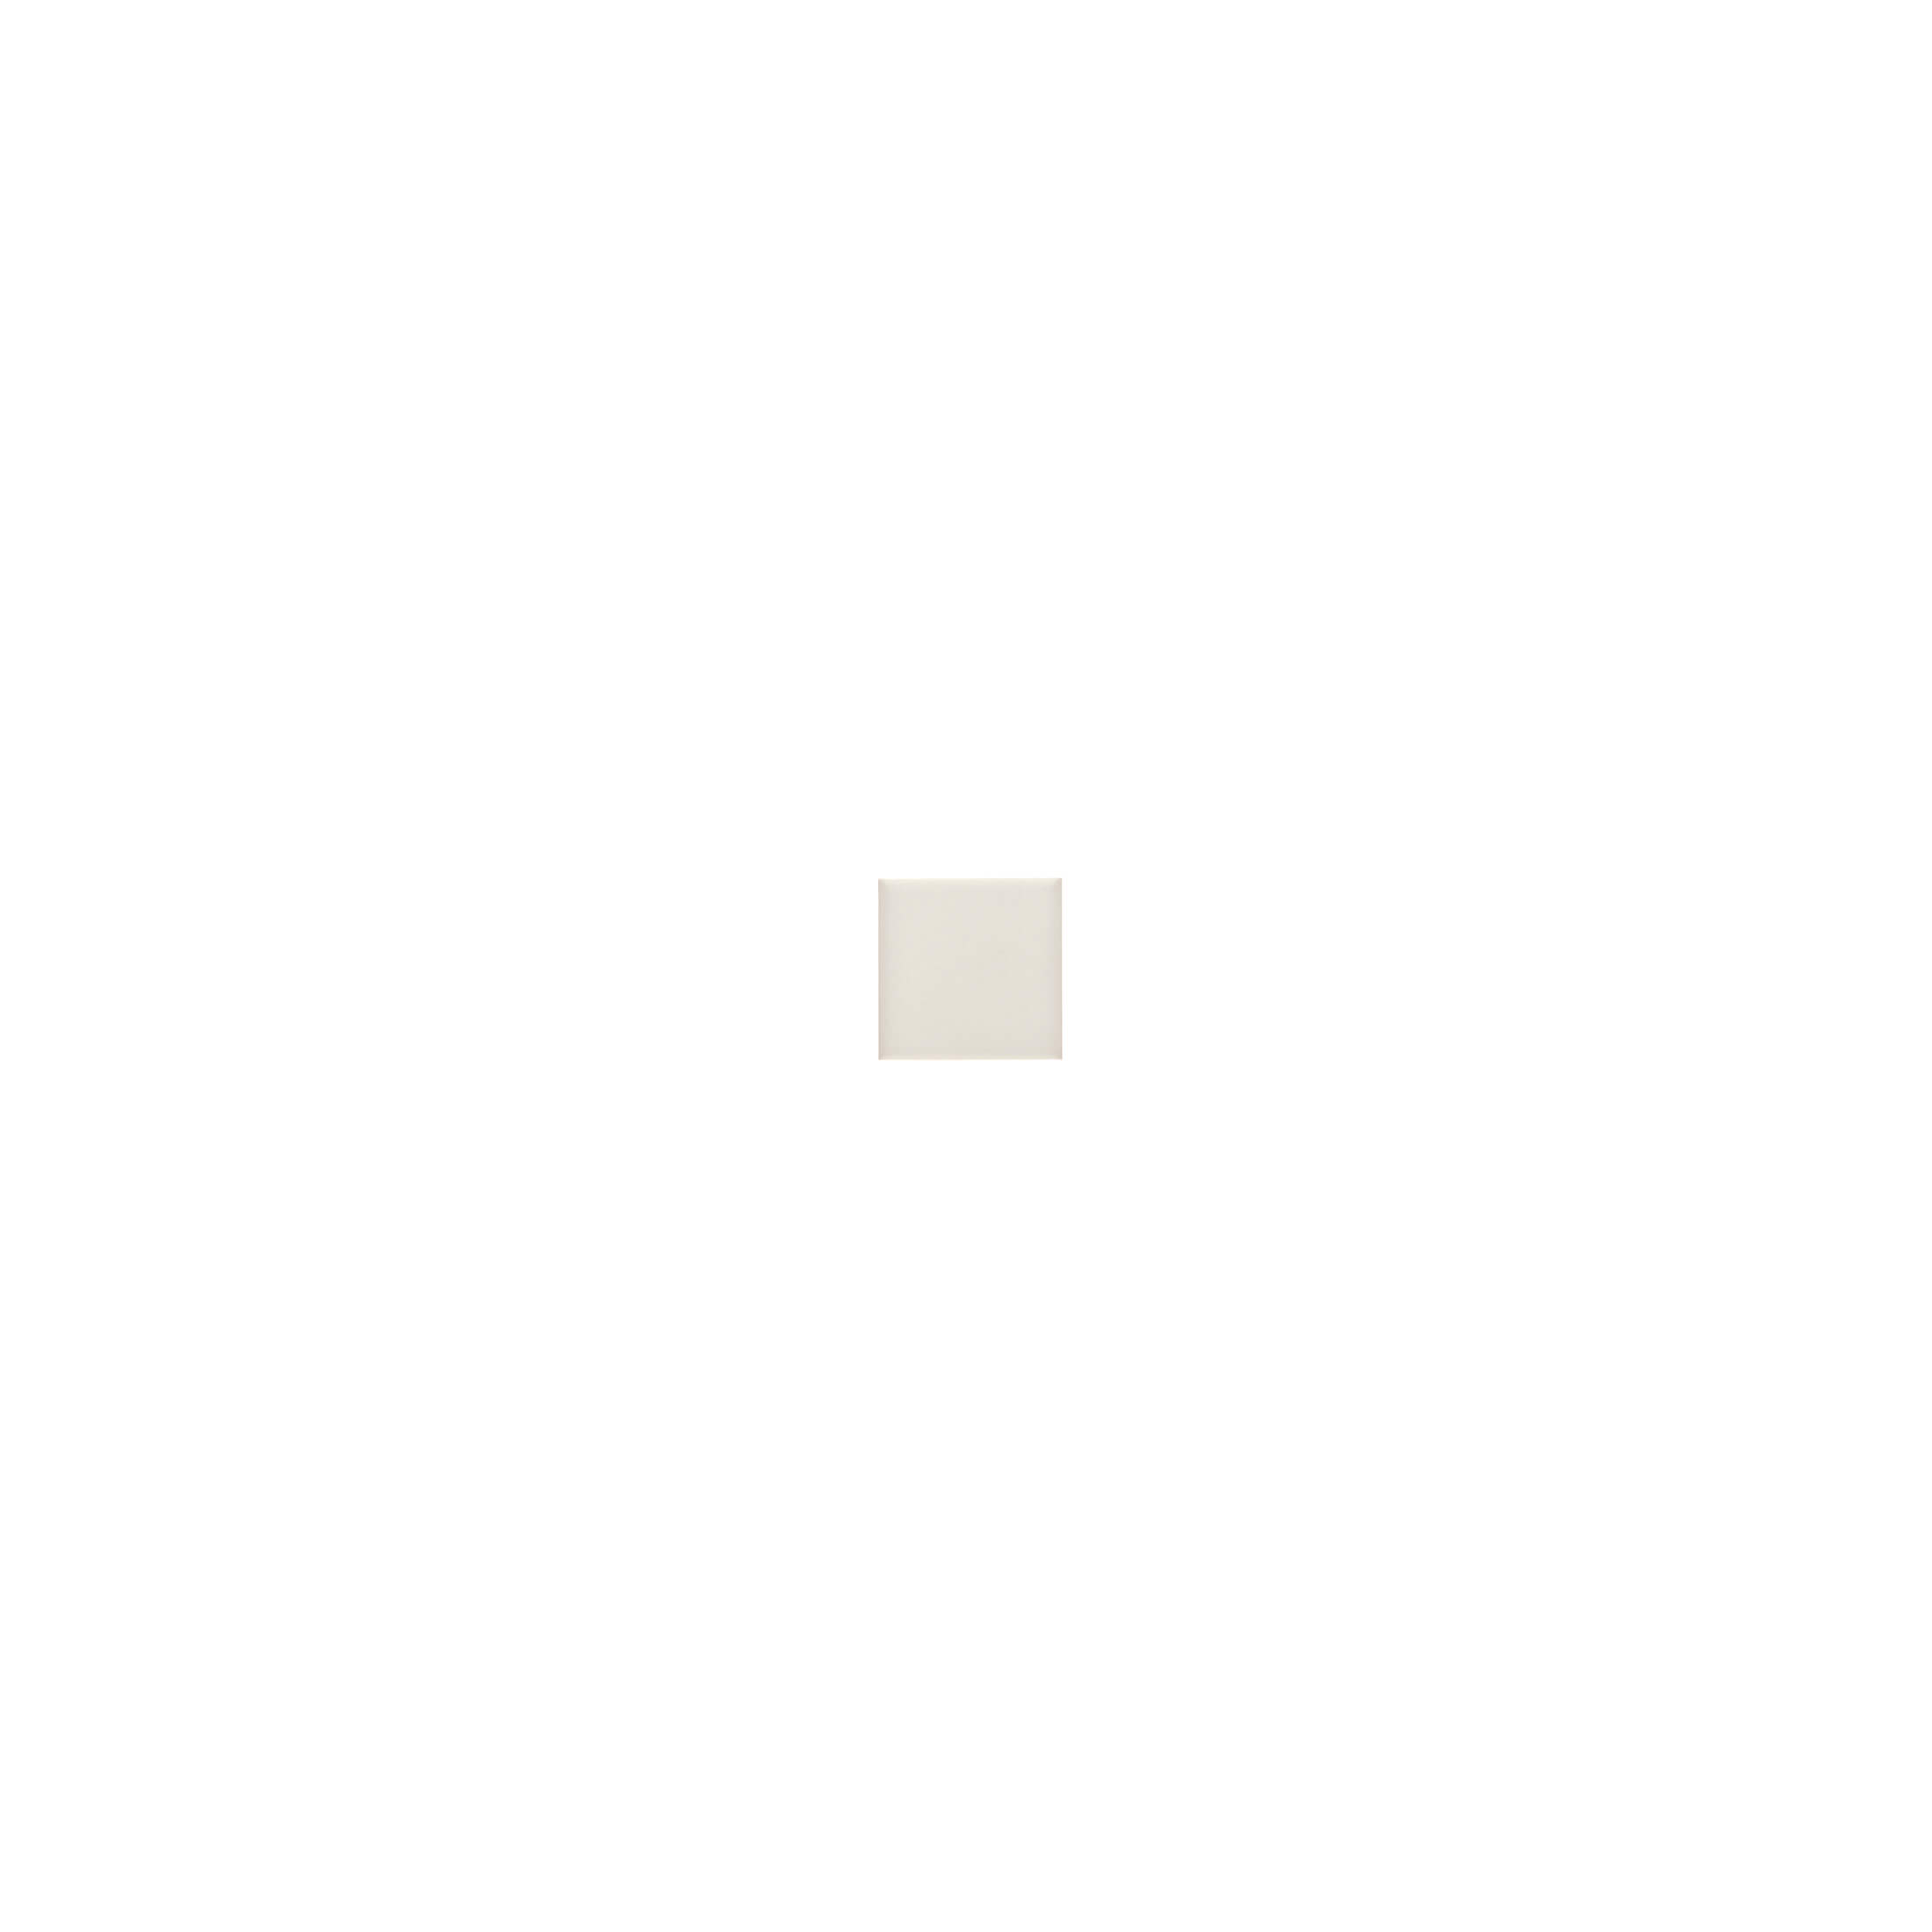 ADPV9005 - PAVIMENTO TACO BISCUIT - 3 cm X 3 cm